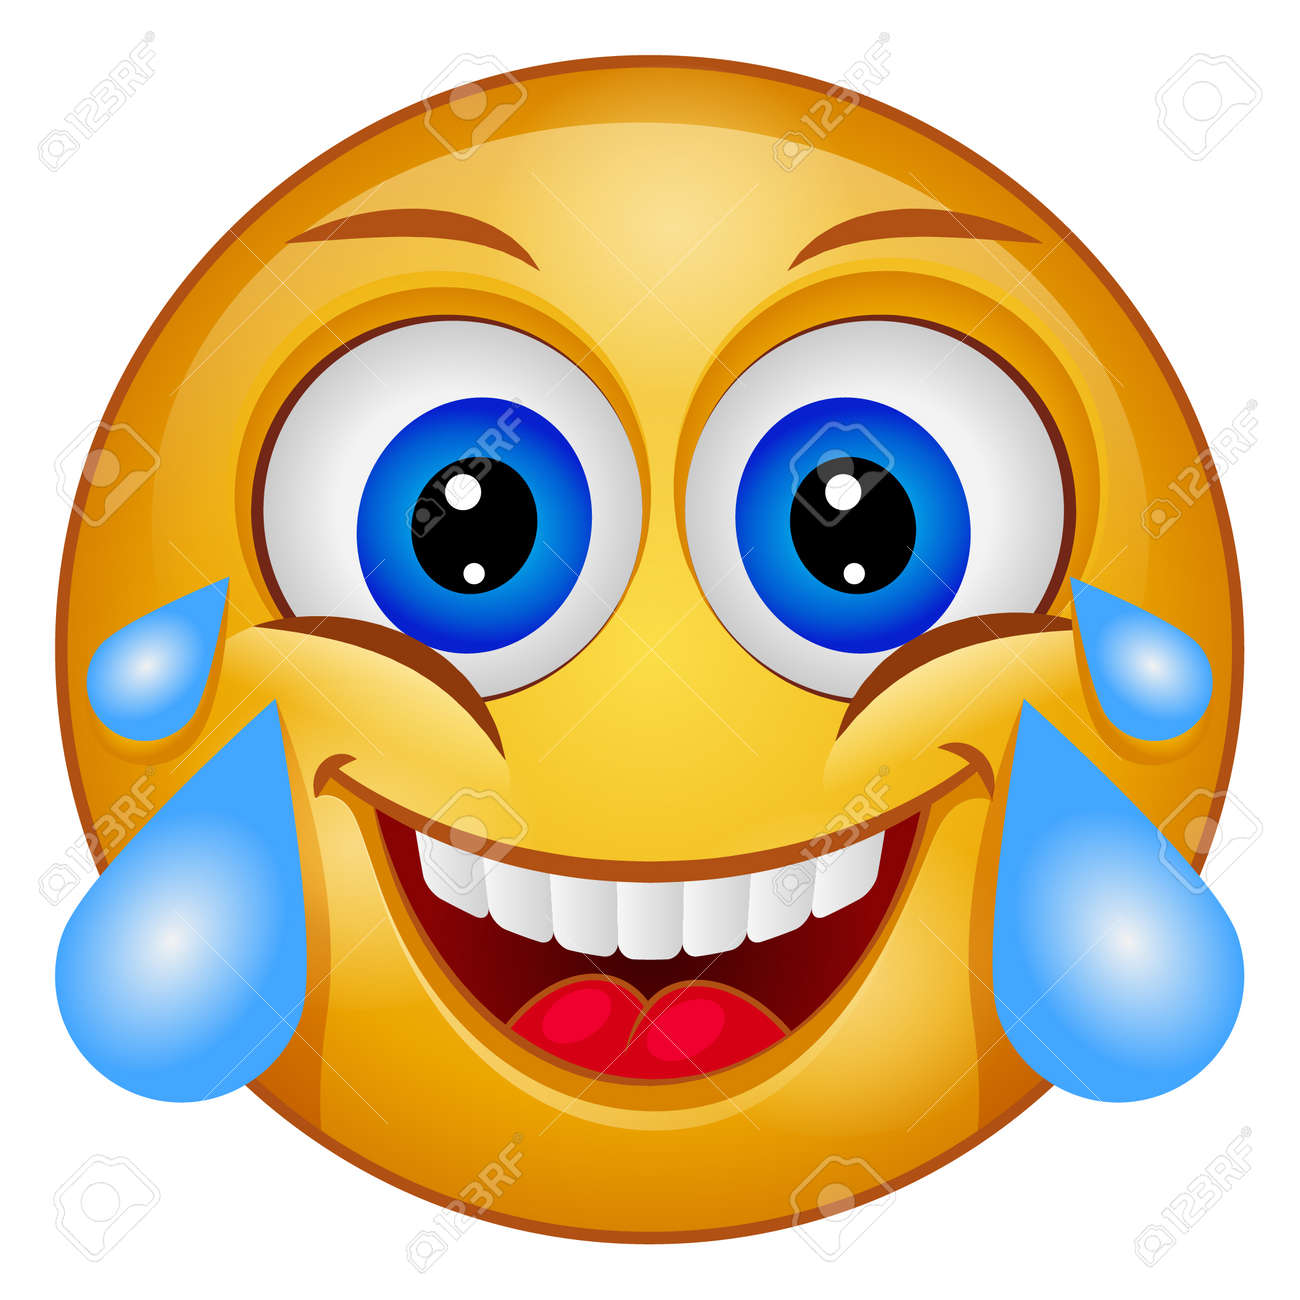 Gradient color icon for emoji face. - 158140081